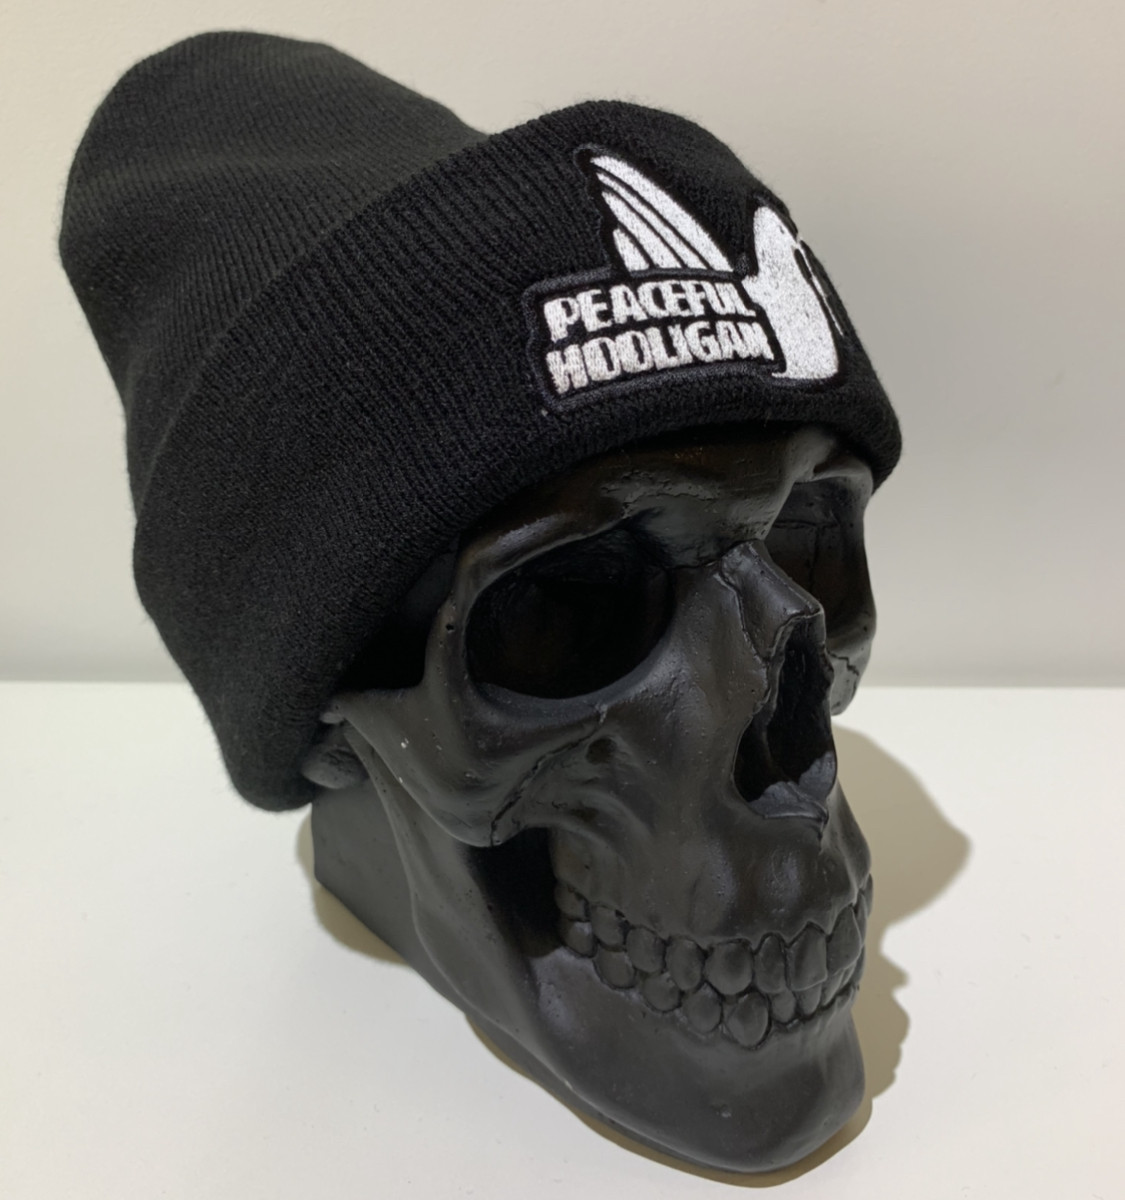 Шапка мужская Peaceful Hooligan - ❄️ Winter ❄️ Black/White